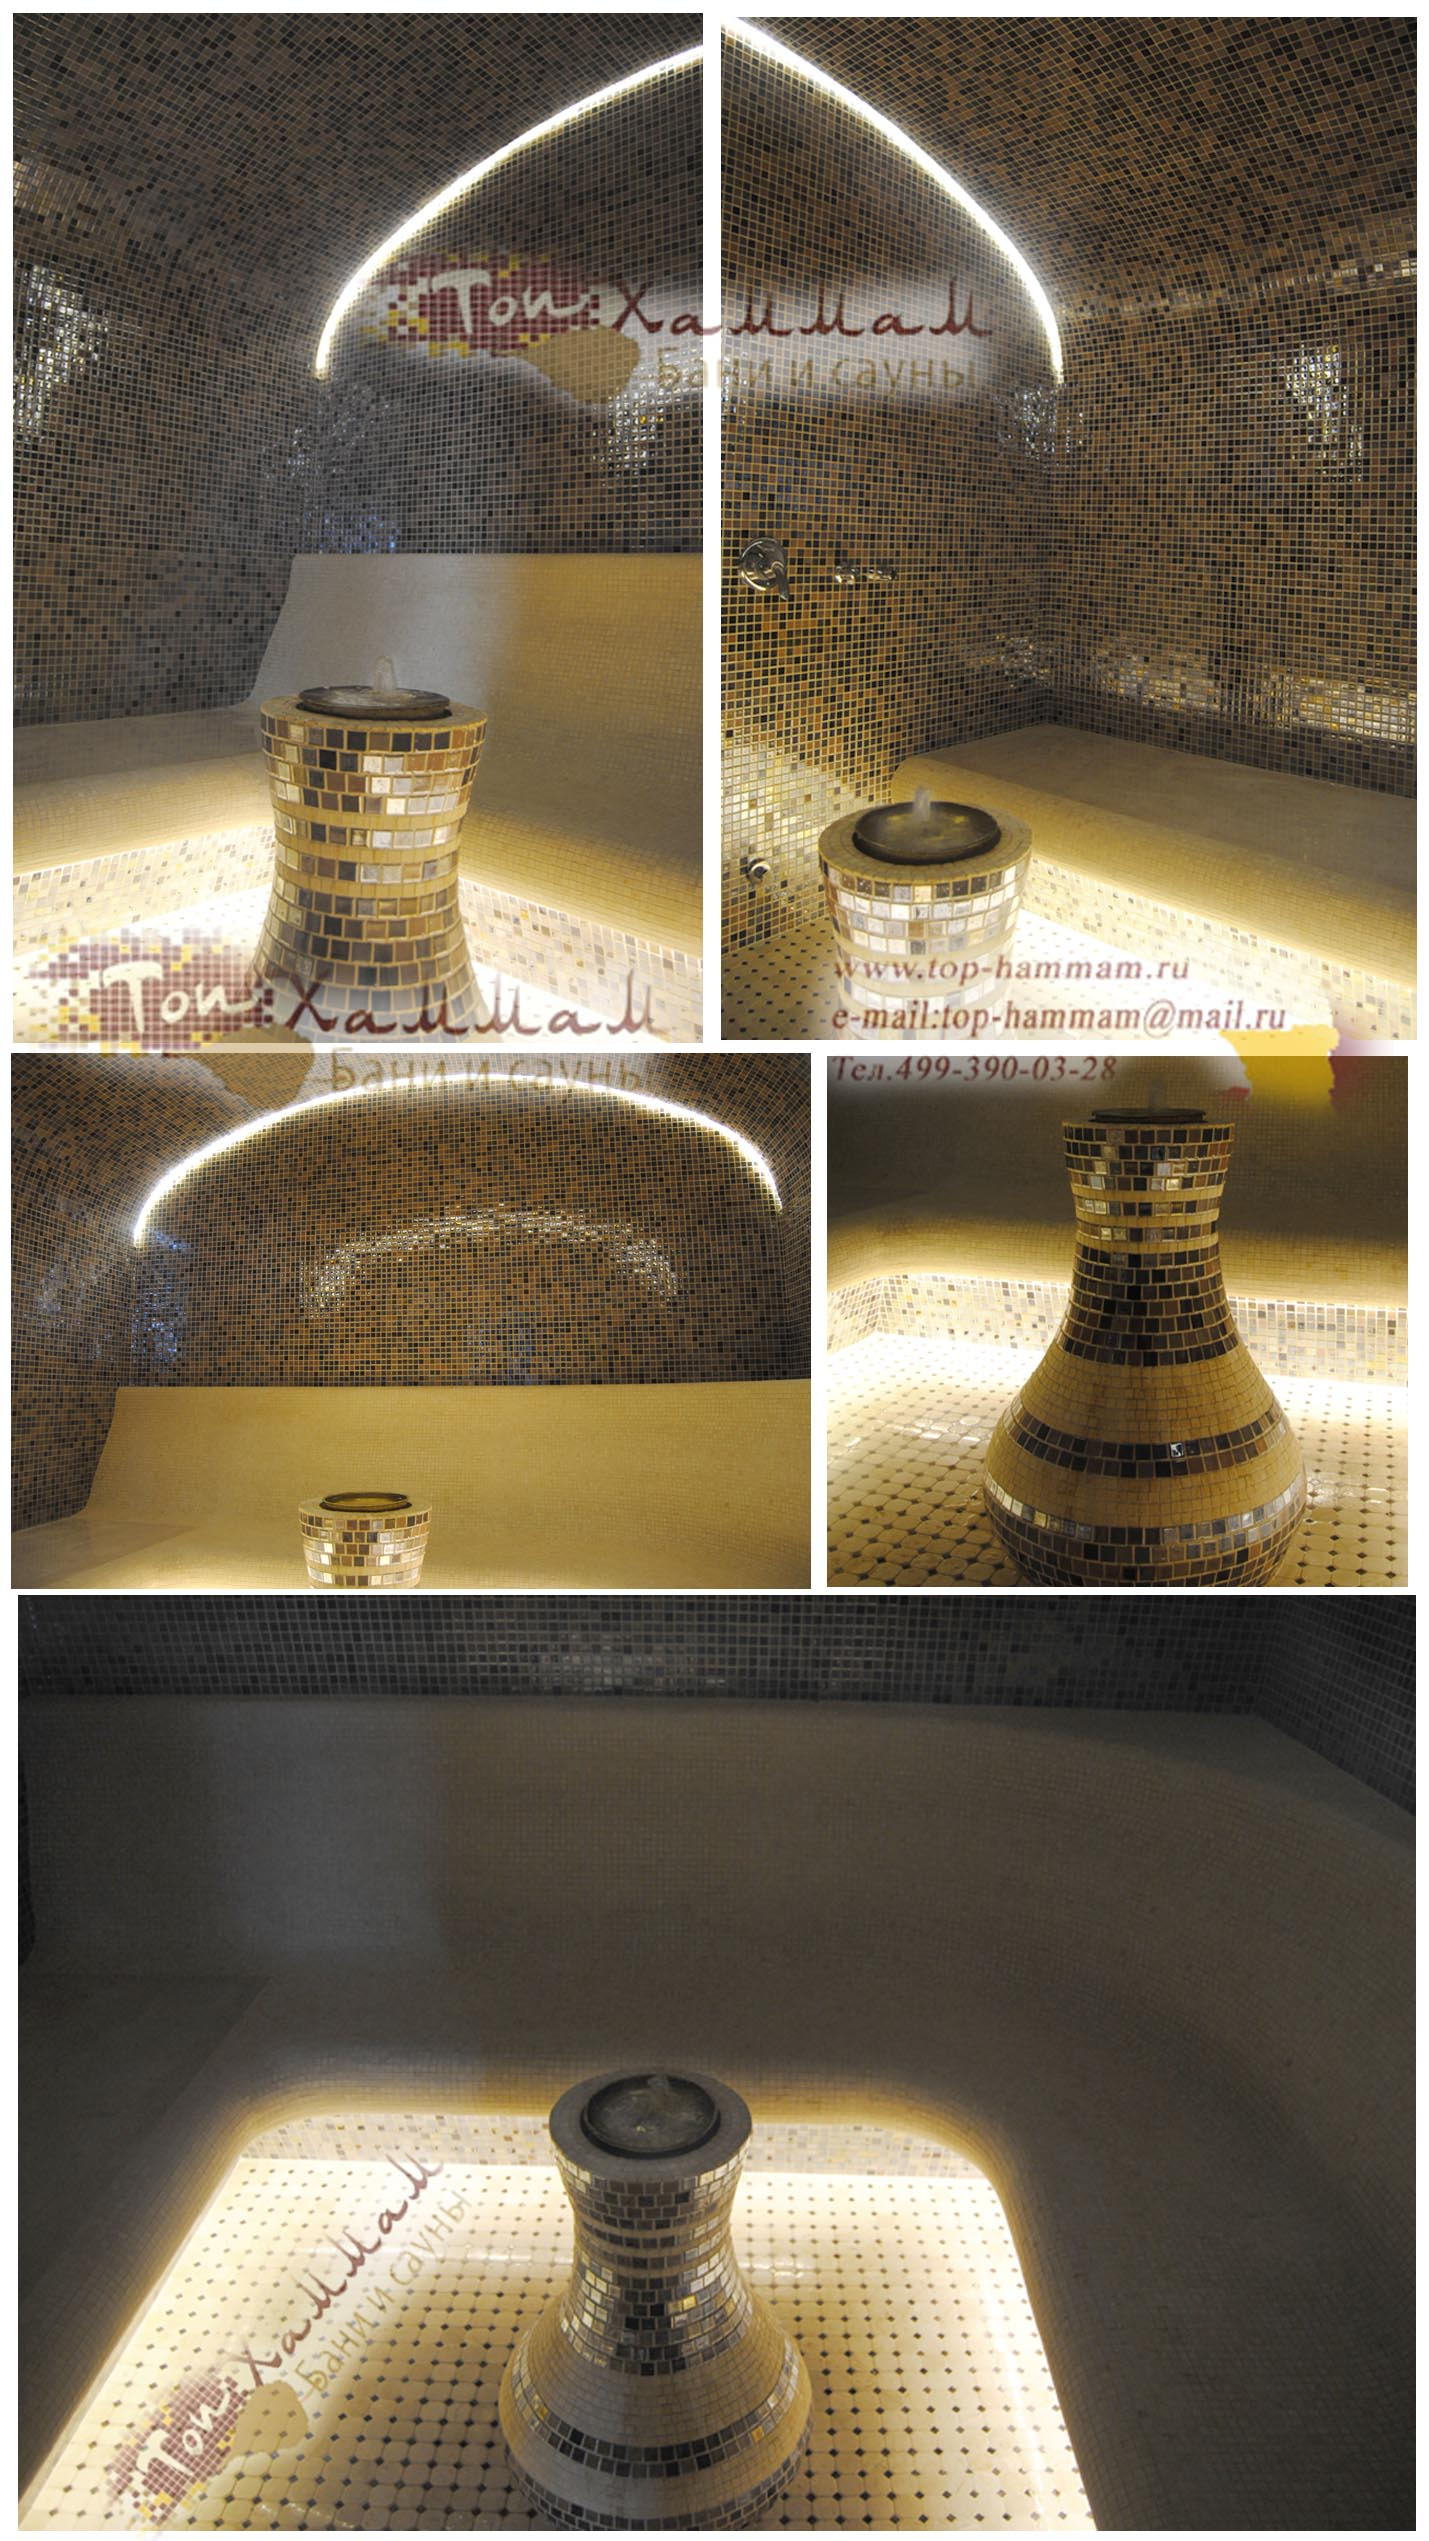 Турецкая баня хамам с фонтаном в виде кувшина